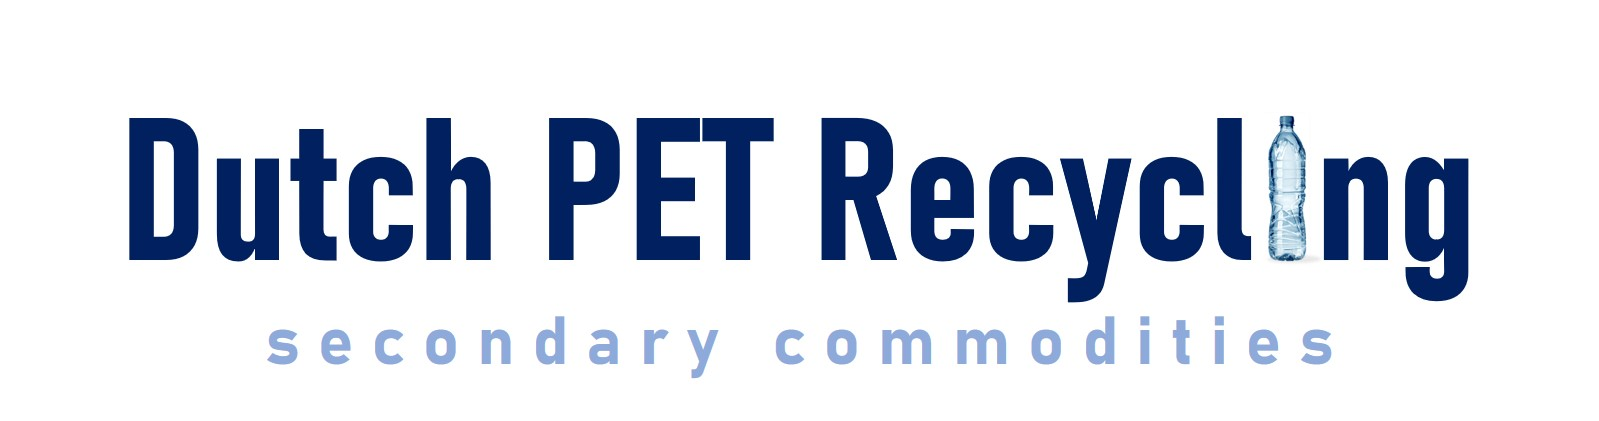 https://europeanplasticspact.org/wp-content/uploads/2021/05/dutch-pet-recycling_logo.jpg